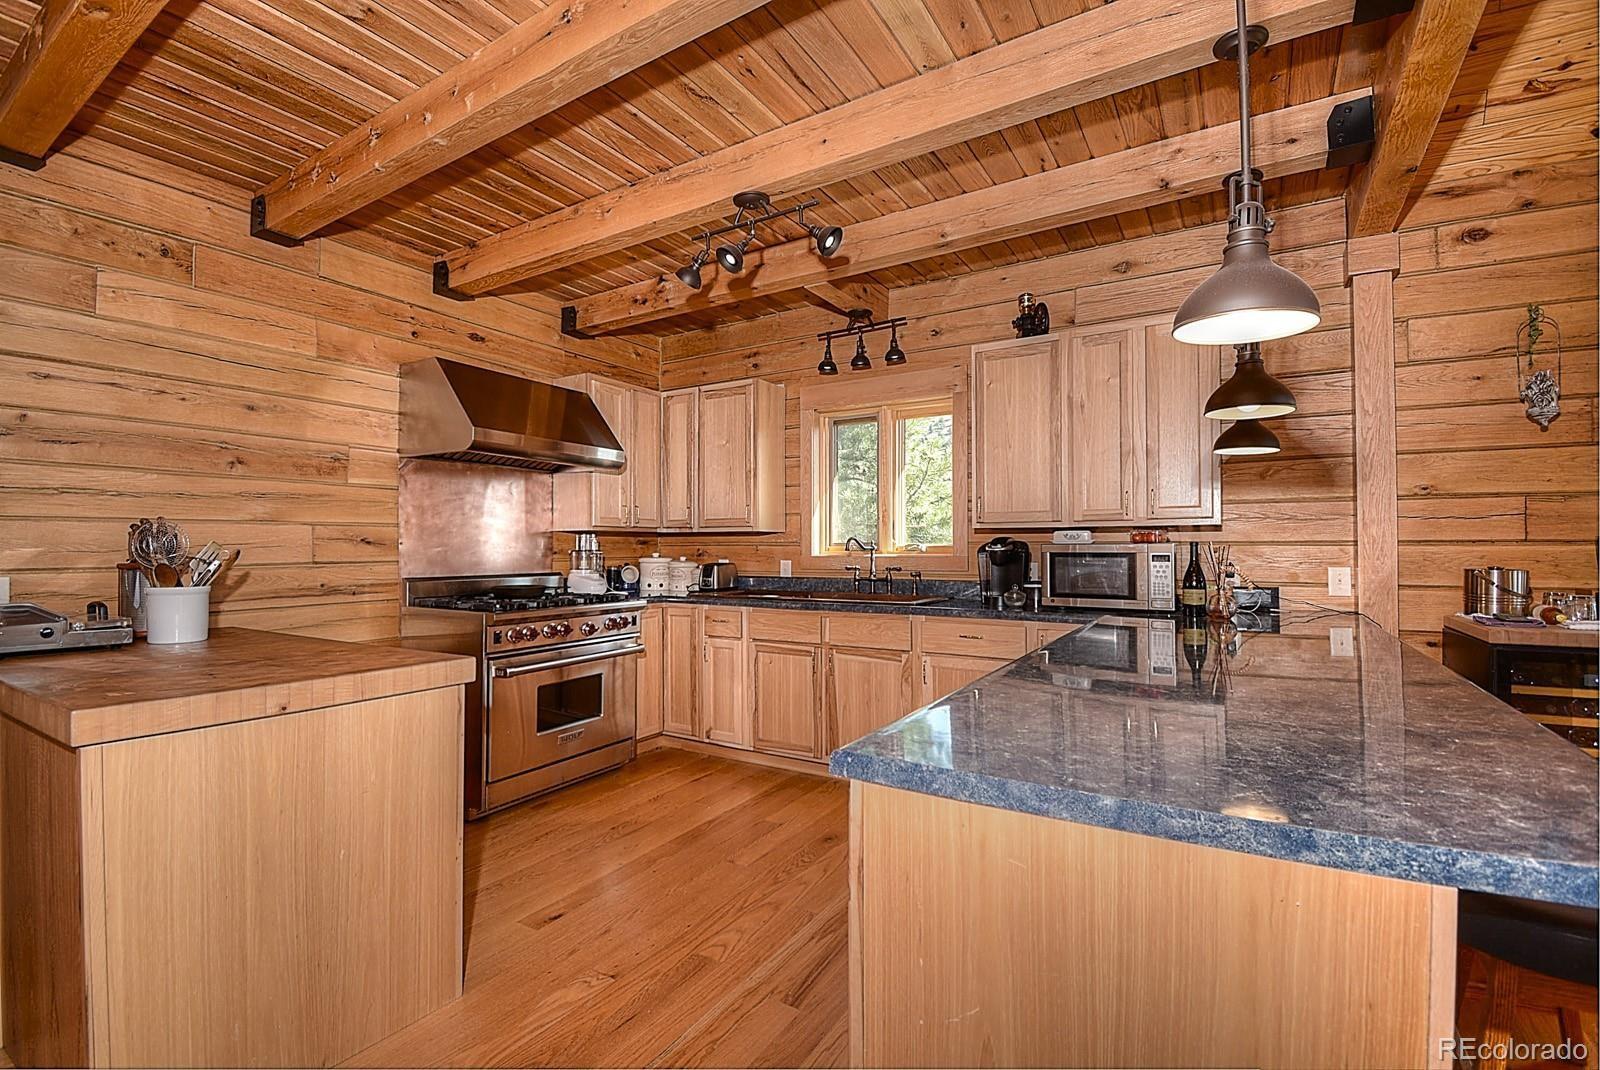 MLS# 8182693 - 12 - 396 Eagle Nest Trail, Guffey, CO 80820